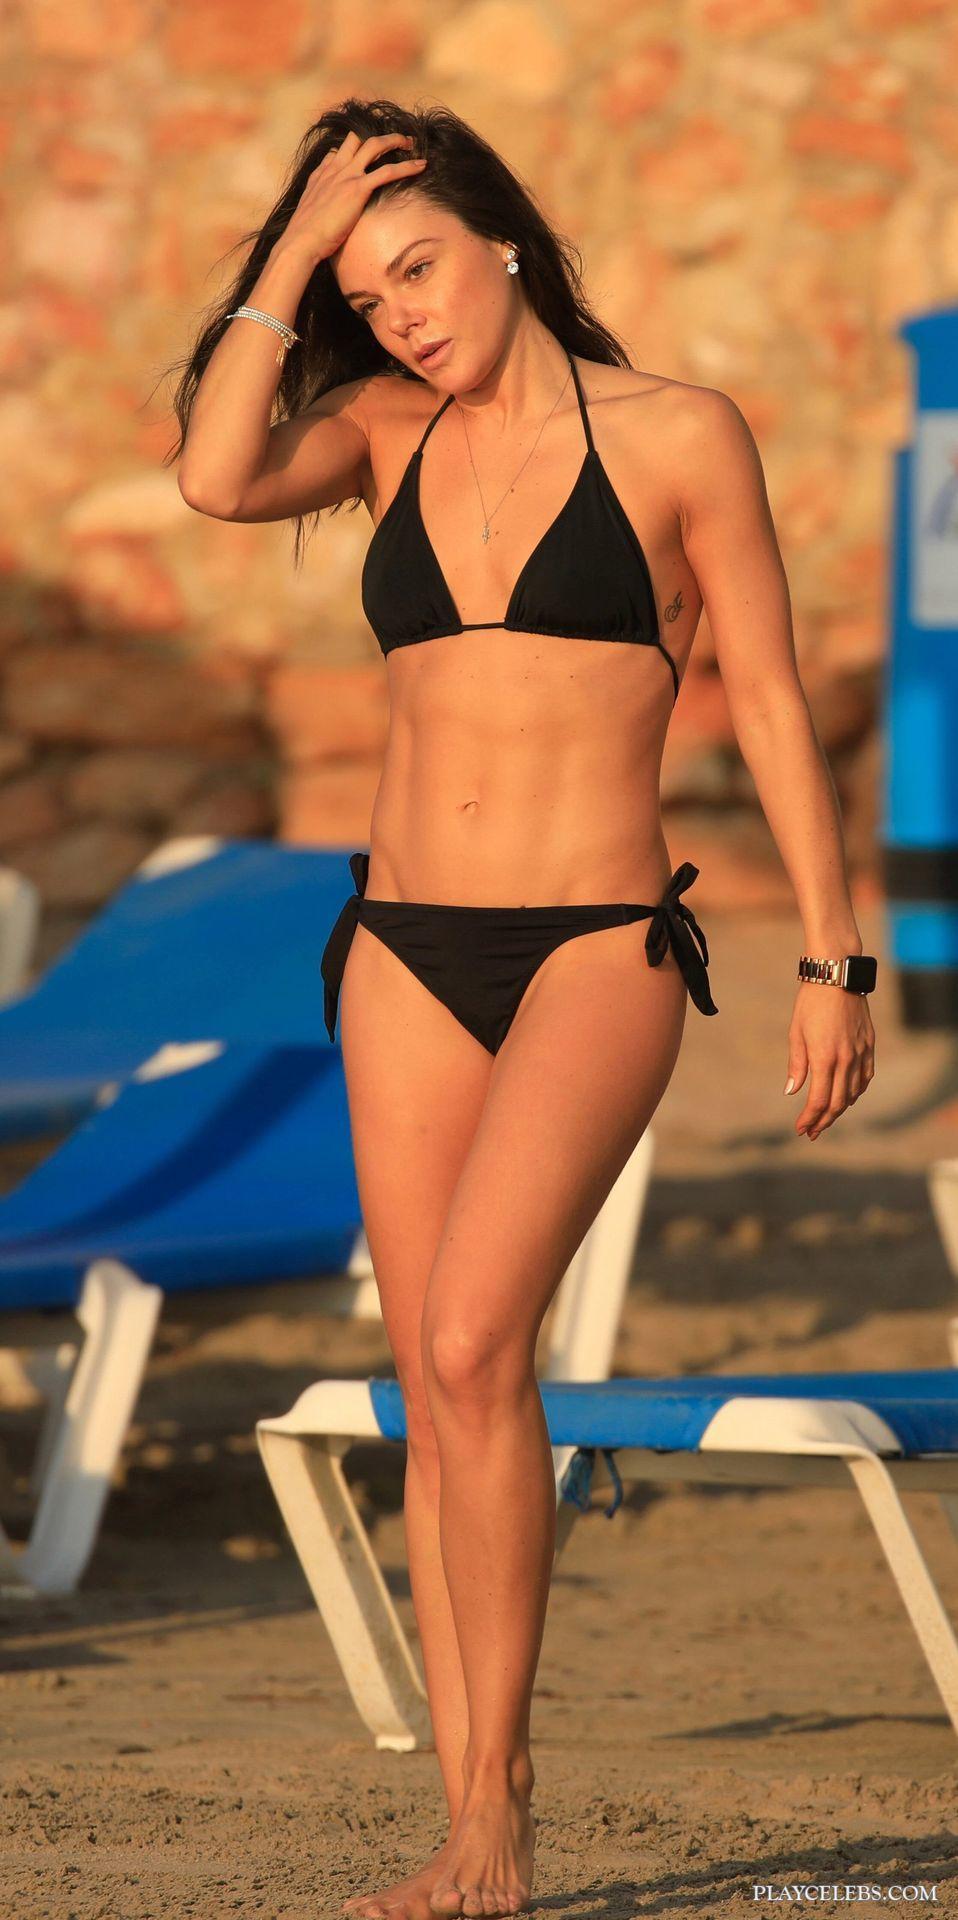 Faye Brookes NipSlip And Bikini Photos